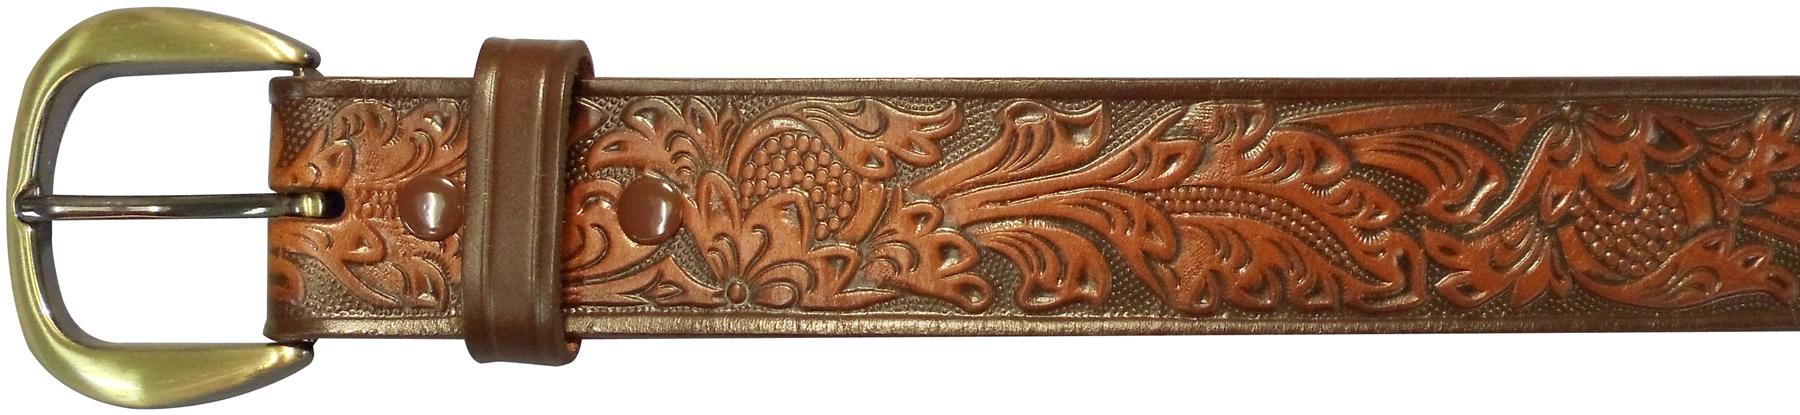 "10610110240 - 40"" Brown Leather Embossed Belt"